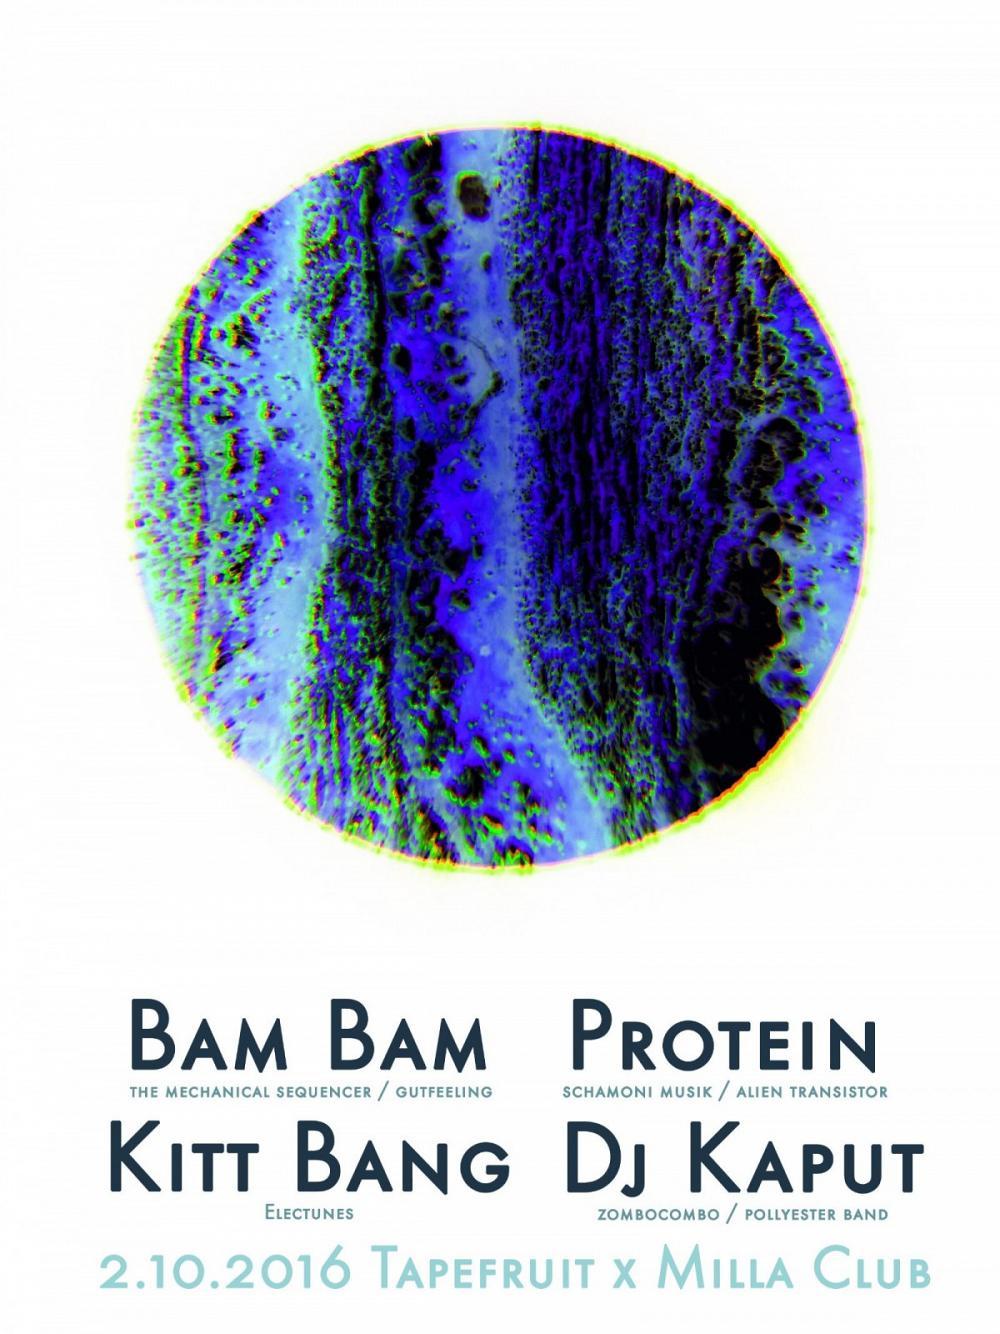 Tapefruit Konzert: Bam Bam + Protein + Kitt Bang | 02.10.2016 @ Milla Club